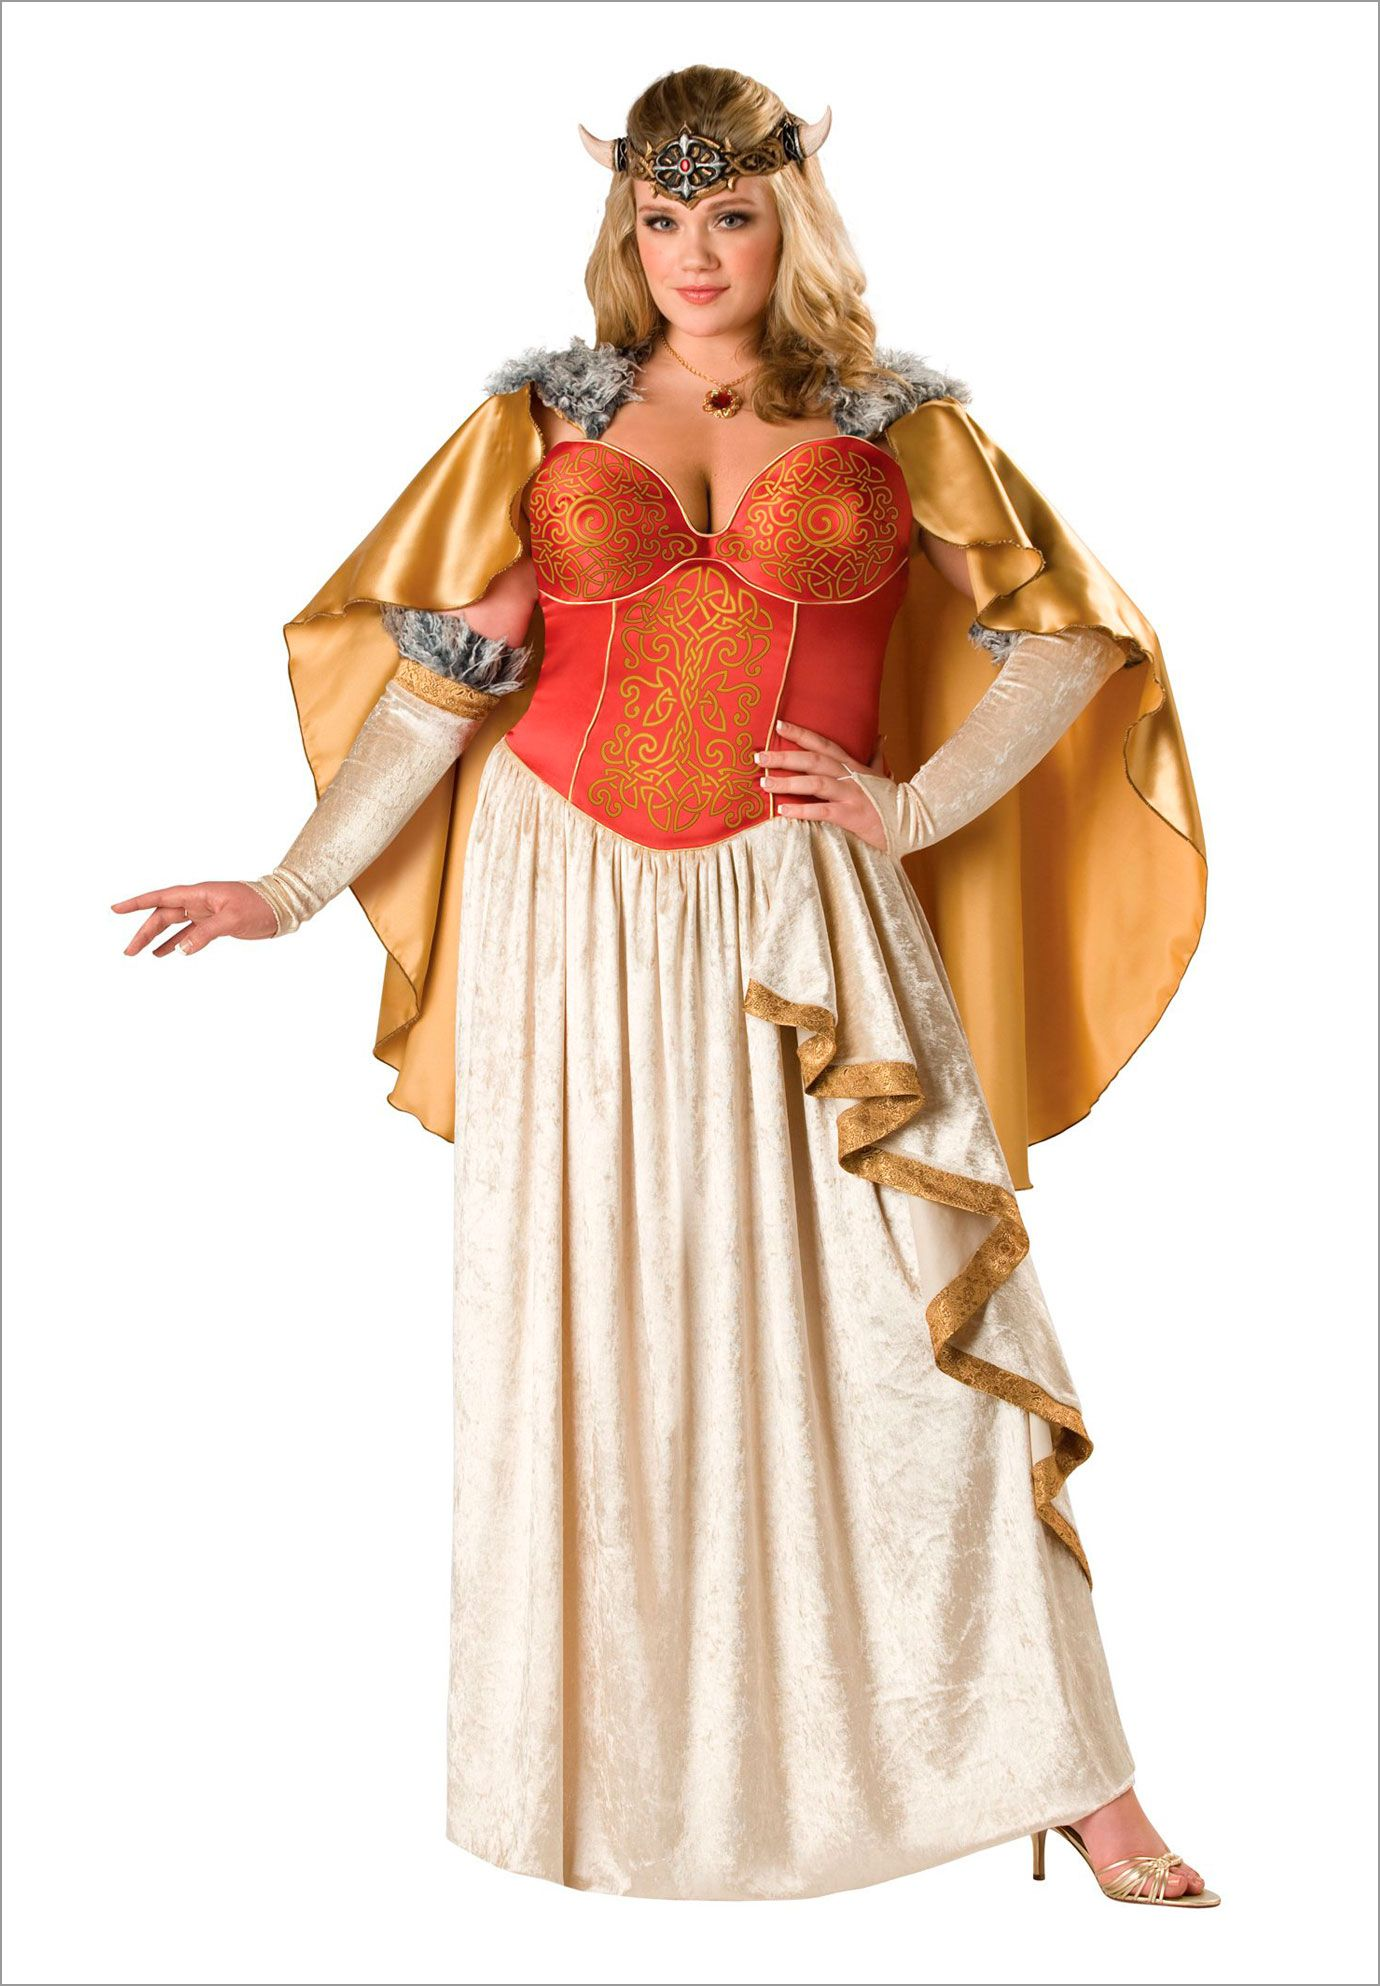 91a0d929b98  137 Plus Size Viking Princess Plus Size Adult Halloween Costume ...